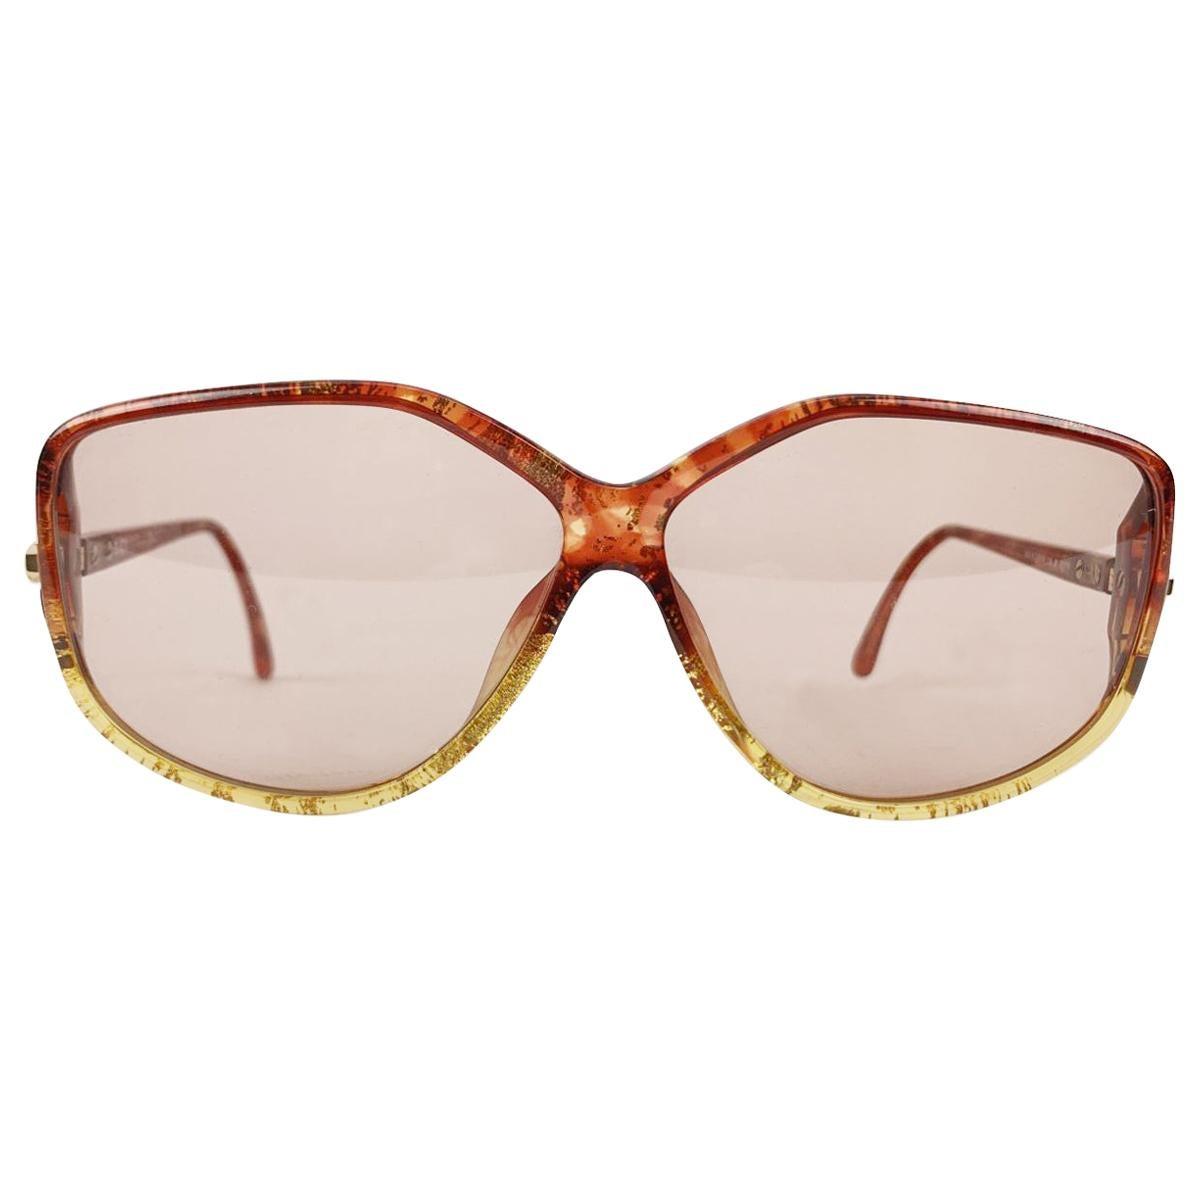 Christian Dior Vintage Optyl Mint Sunglasses 2498 62/10 125 mm